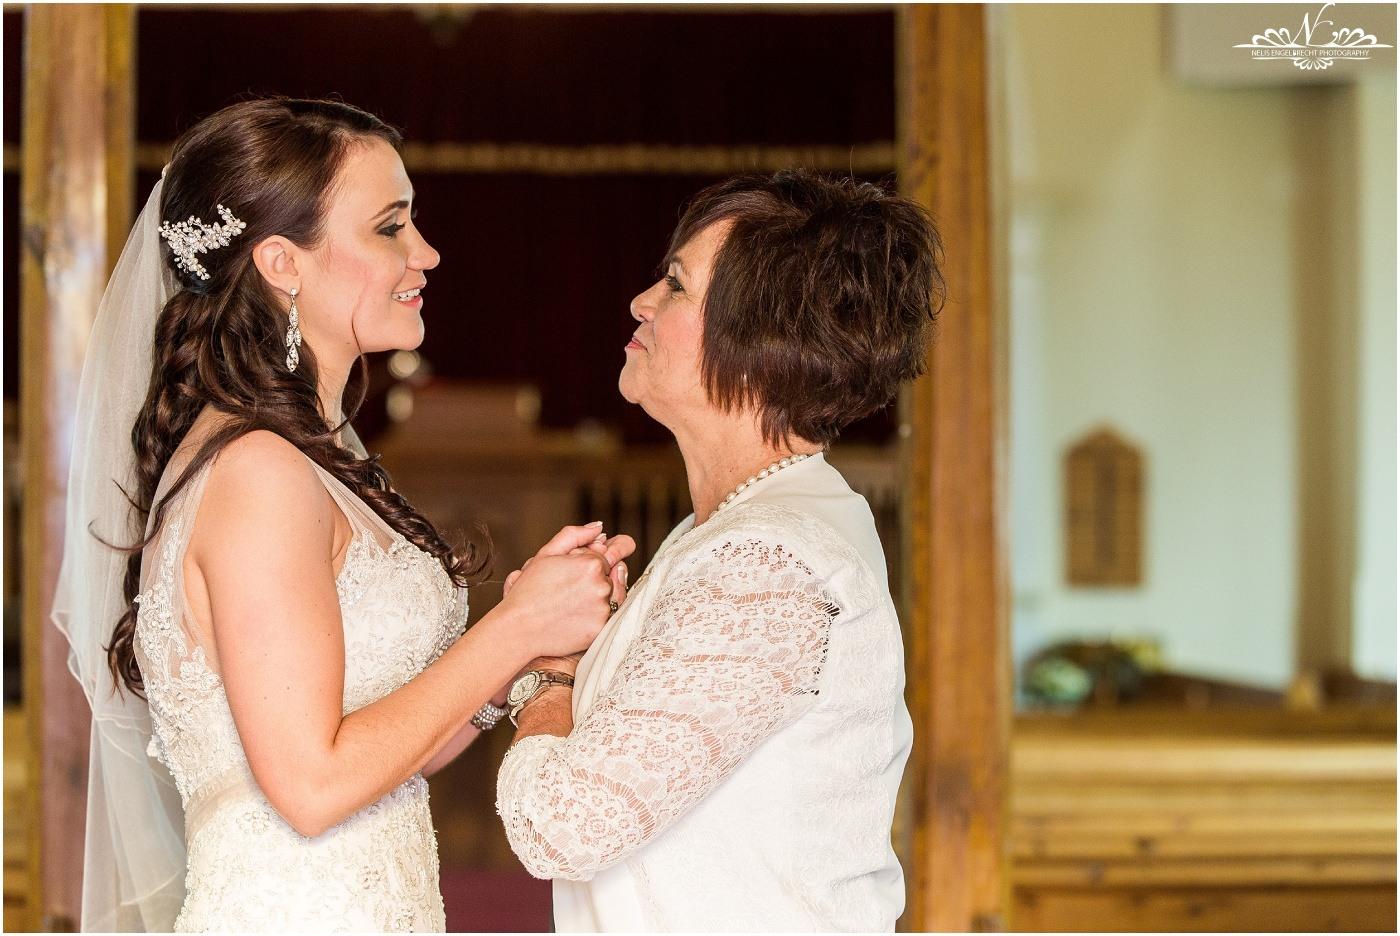 Eensgezind-Wedding-Photos-Nelis-Engelbrecht-Photography-075